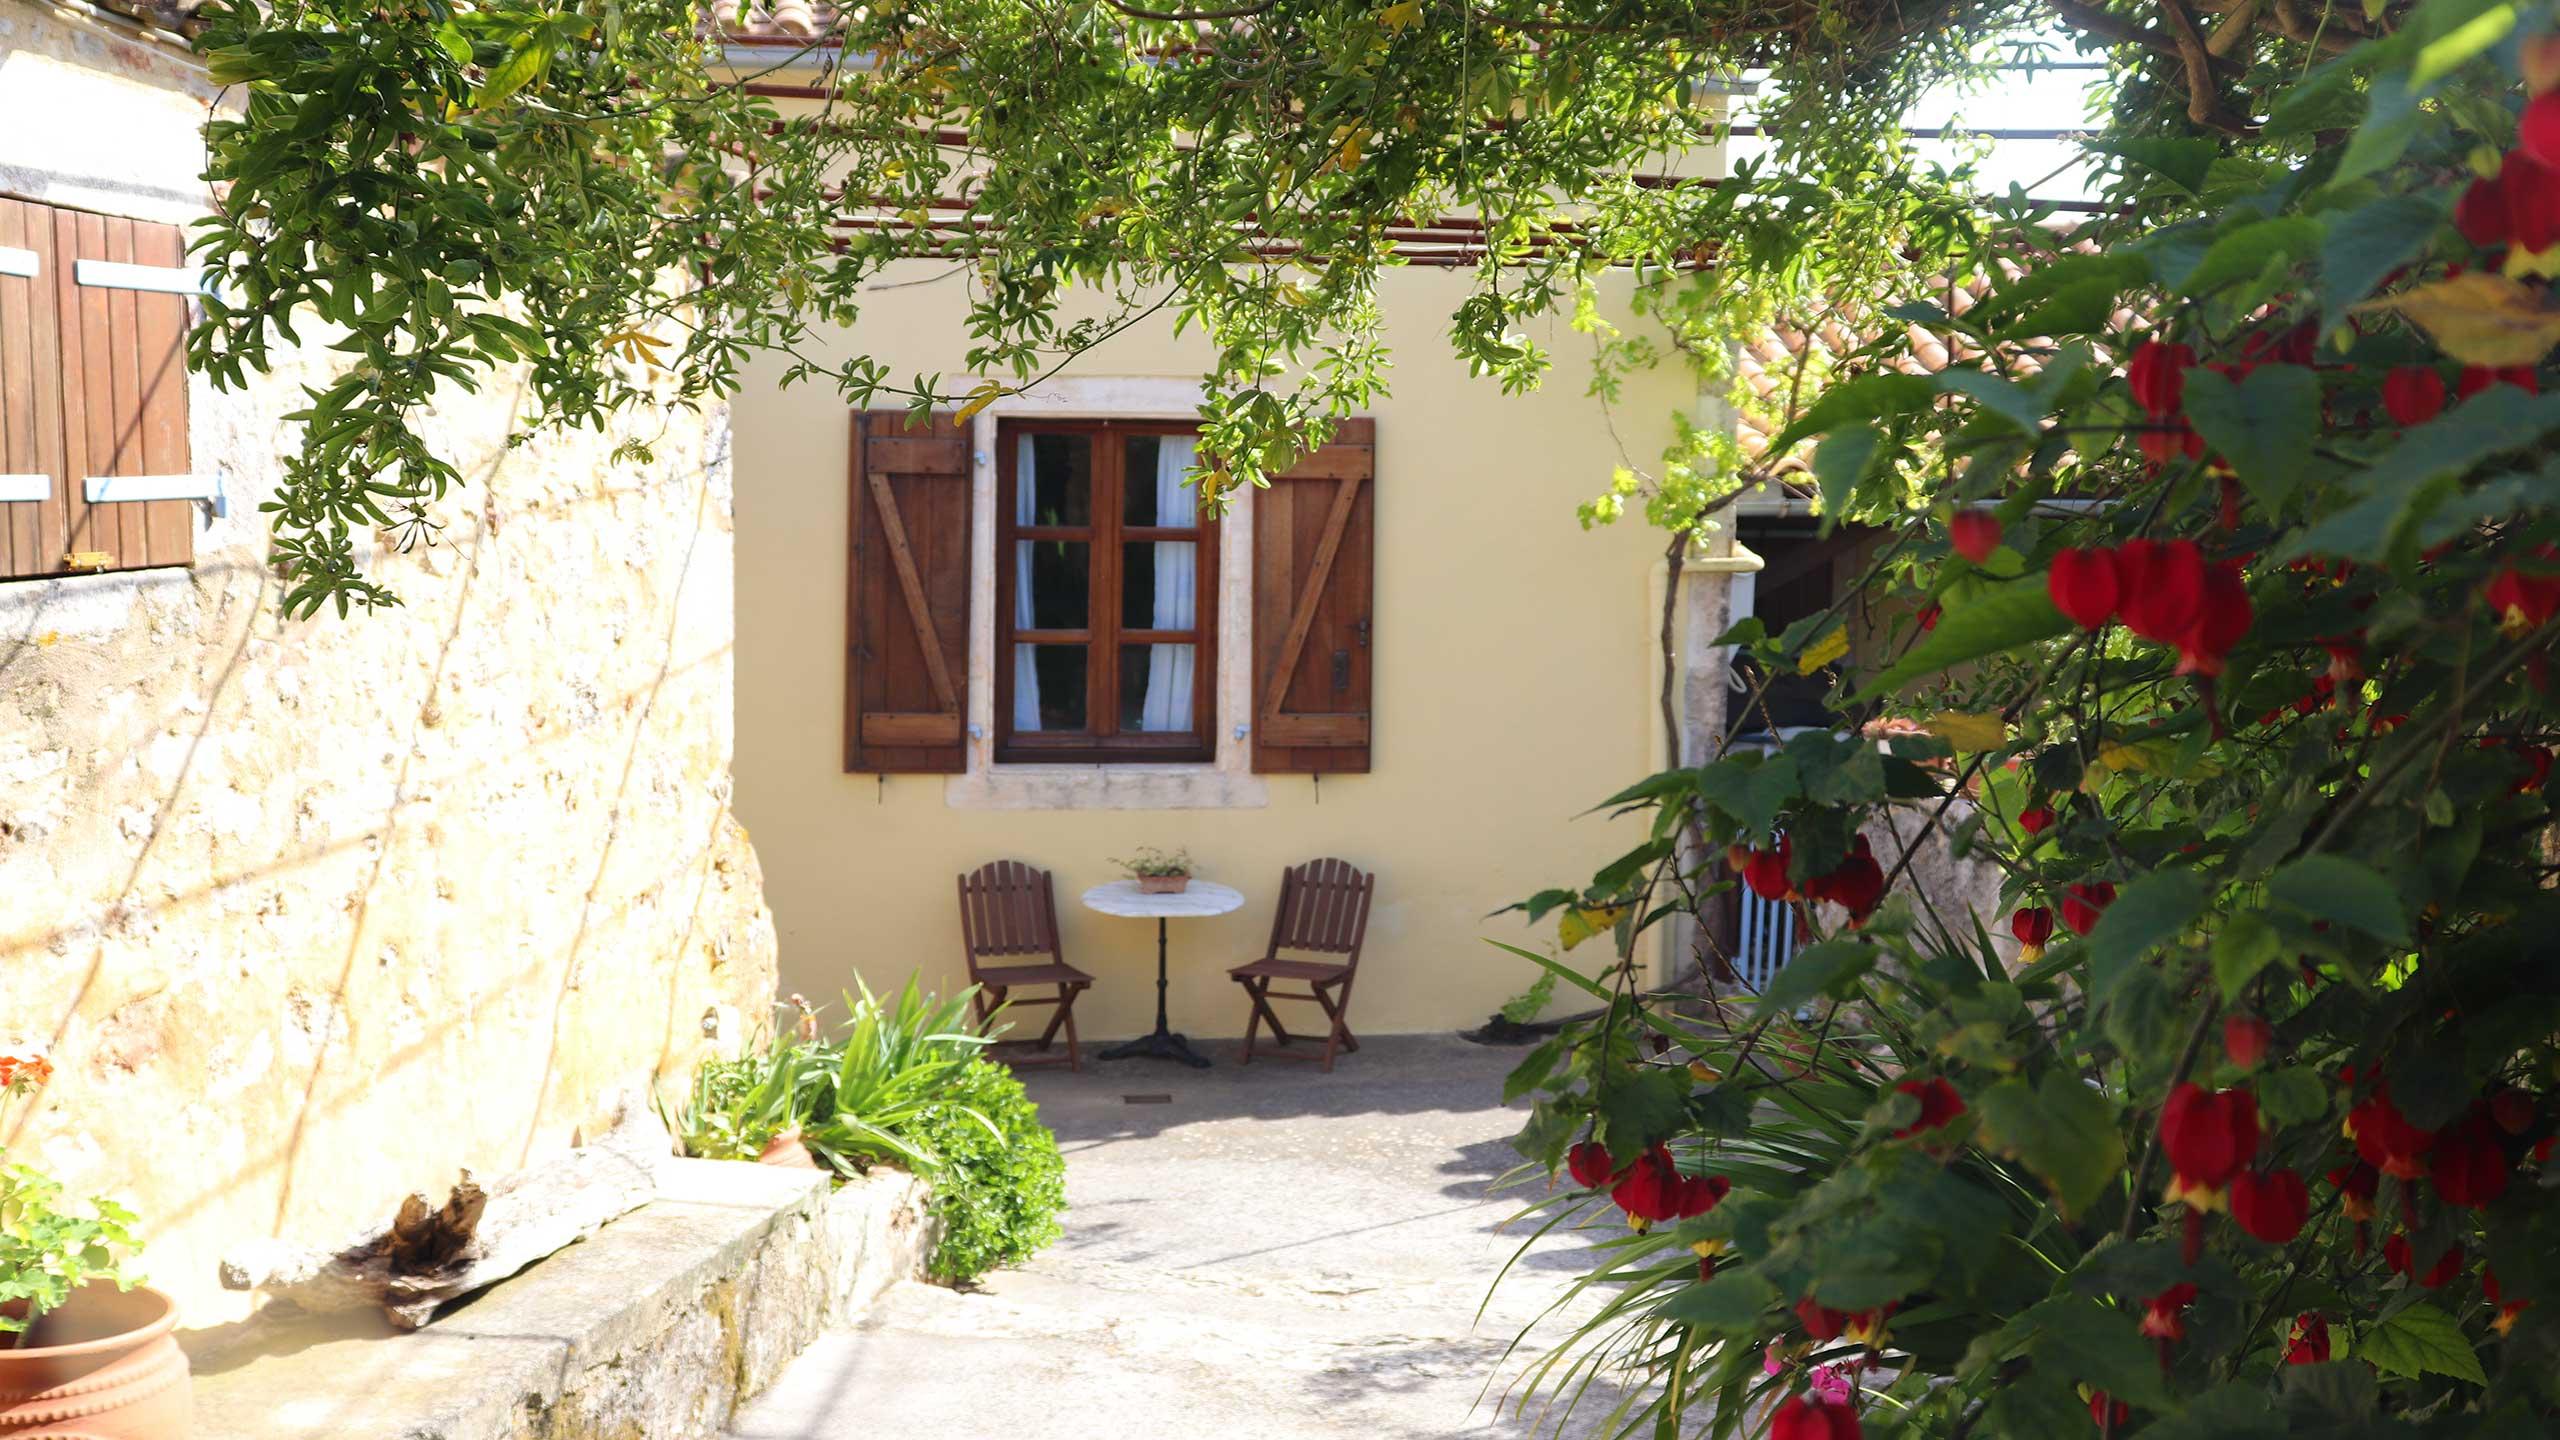 Amigdalospito 'Almond House'